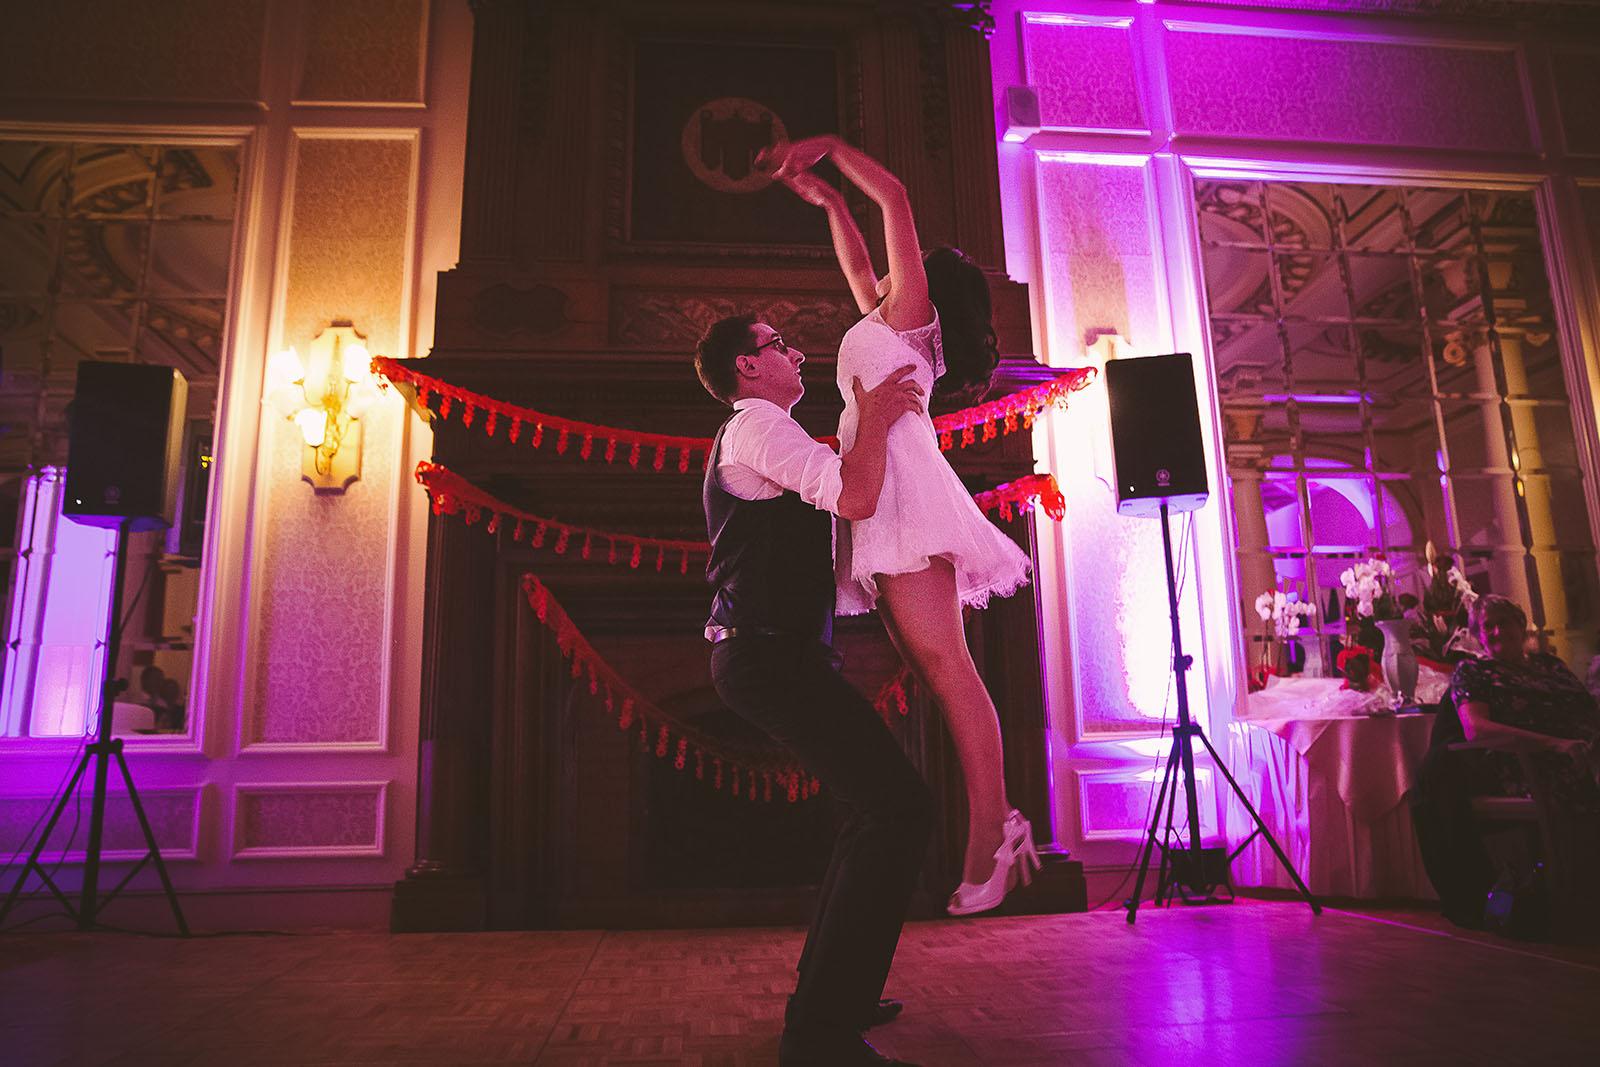 photographe mariage clermont ferrand chine beau laique emotion - Photographe Mariage Clermont Ferrand